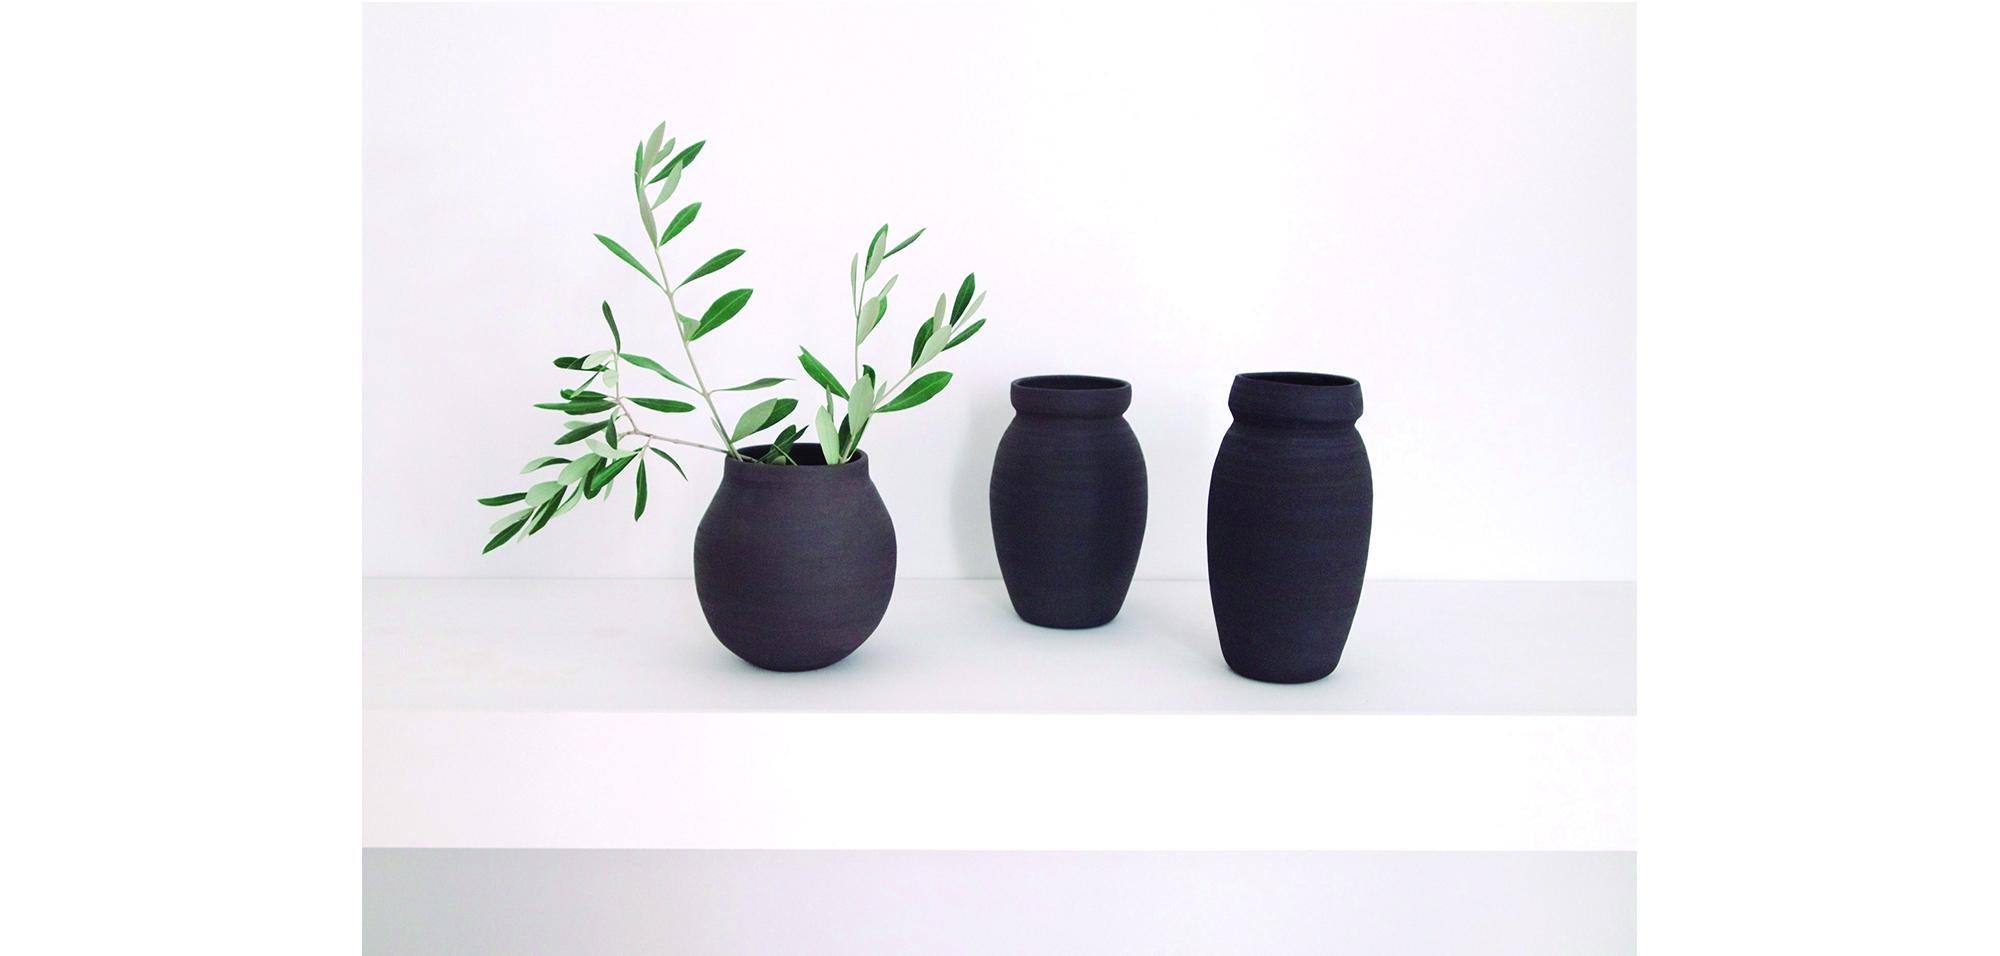 fondo vanner web black vases.jpg